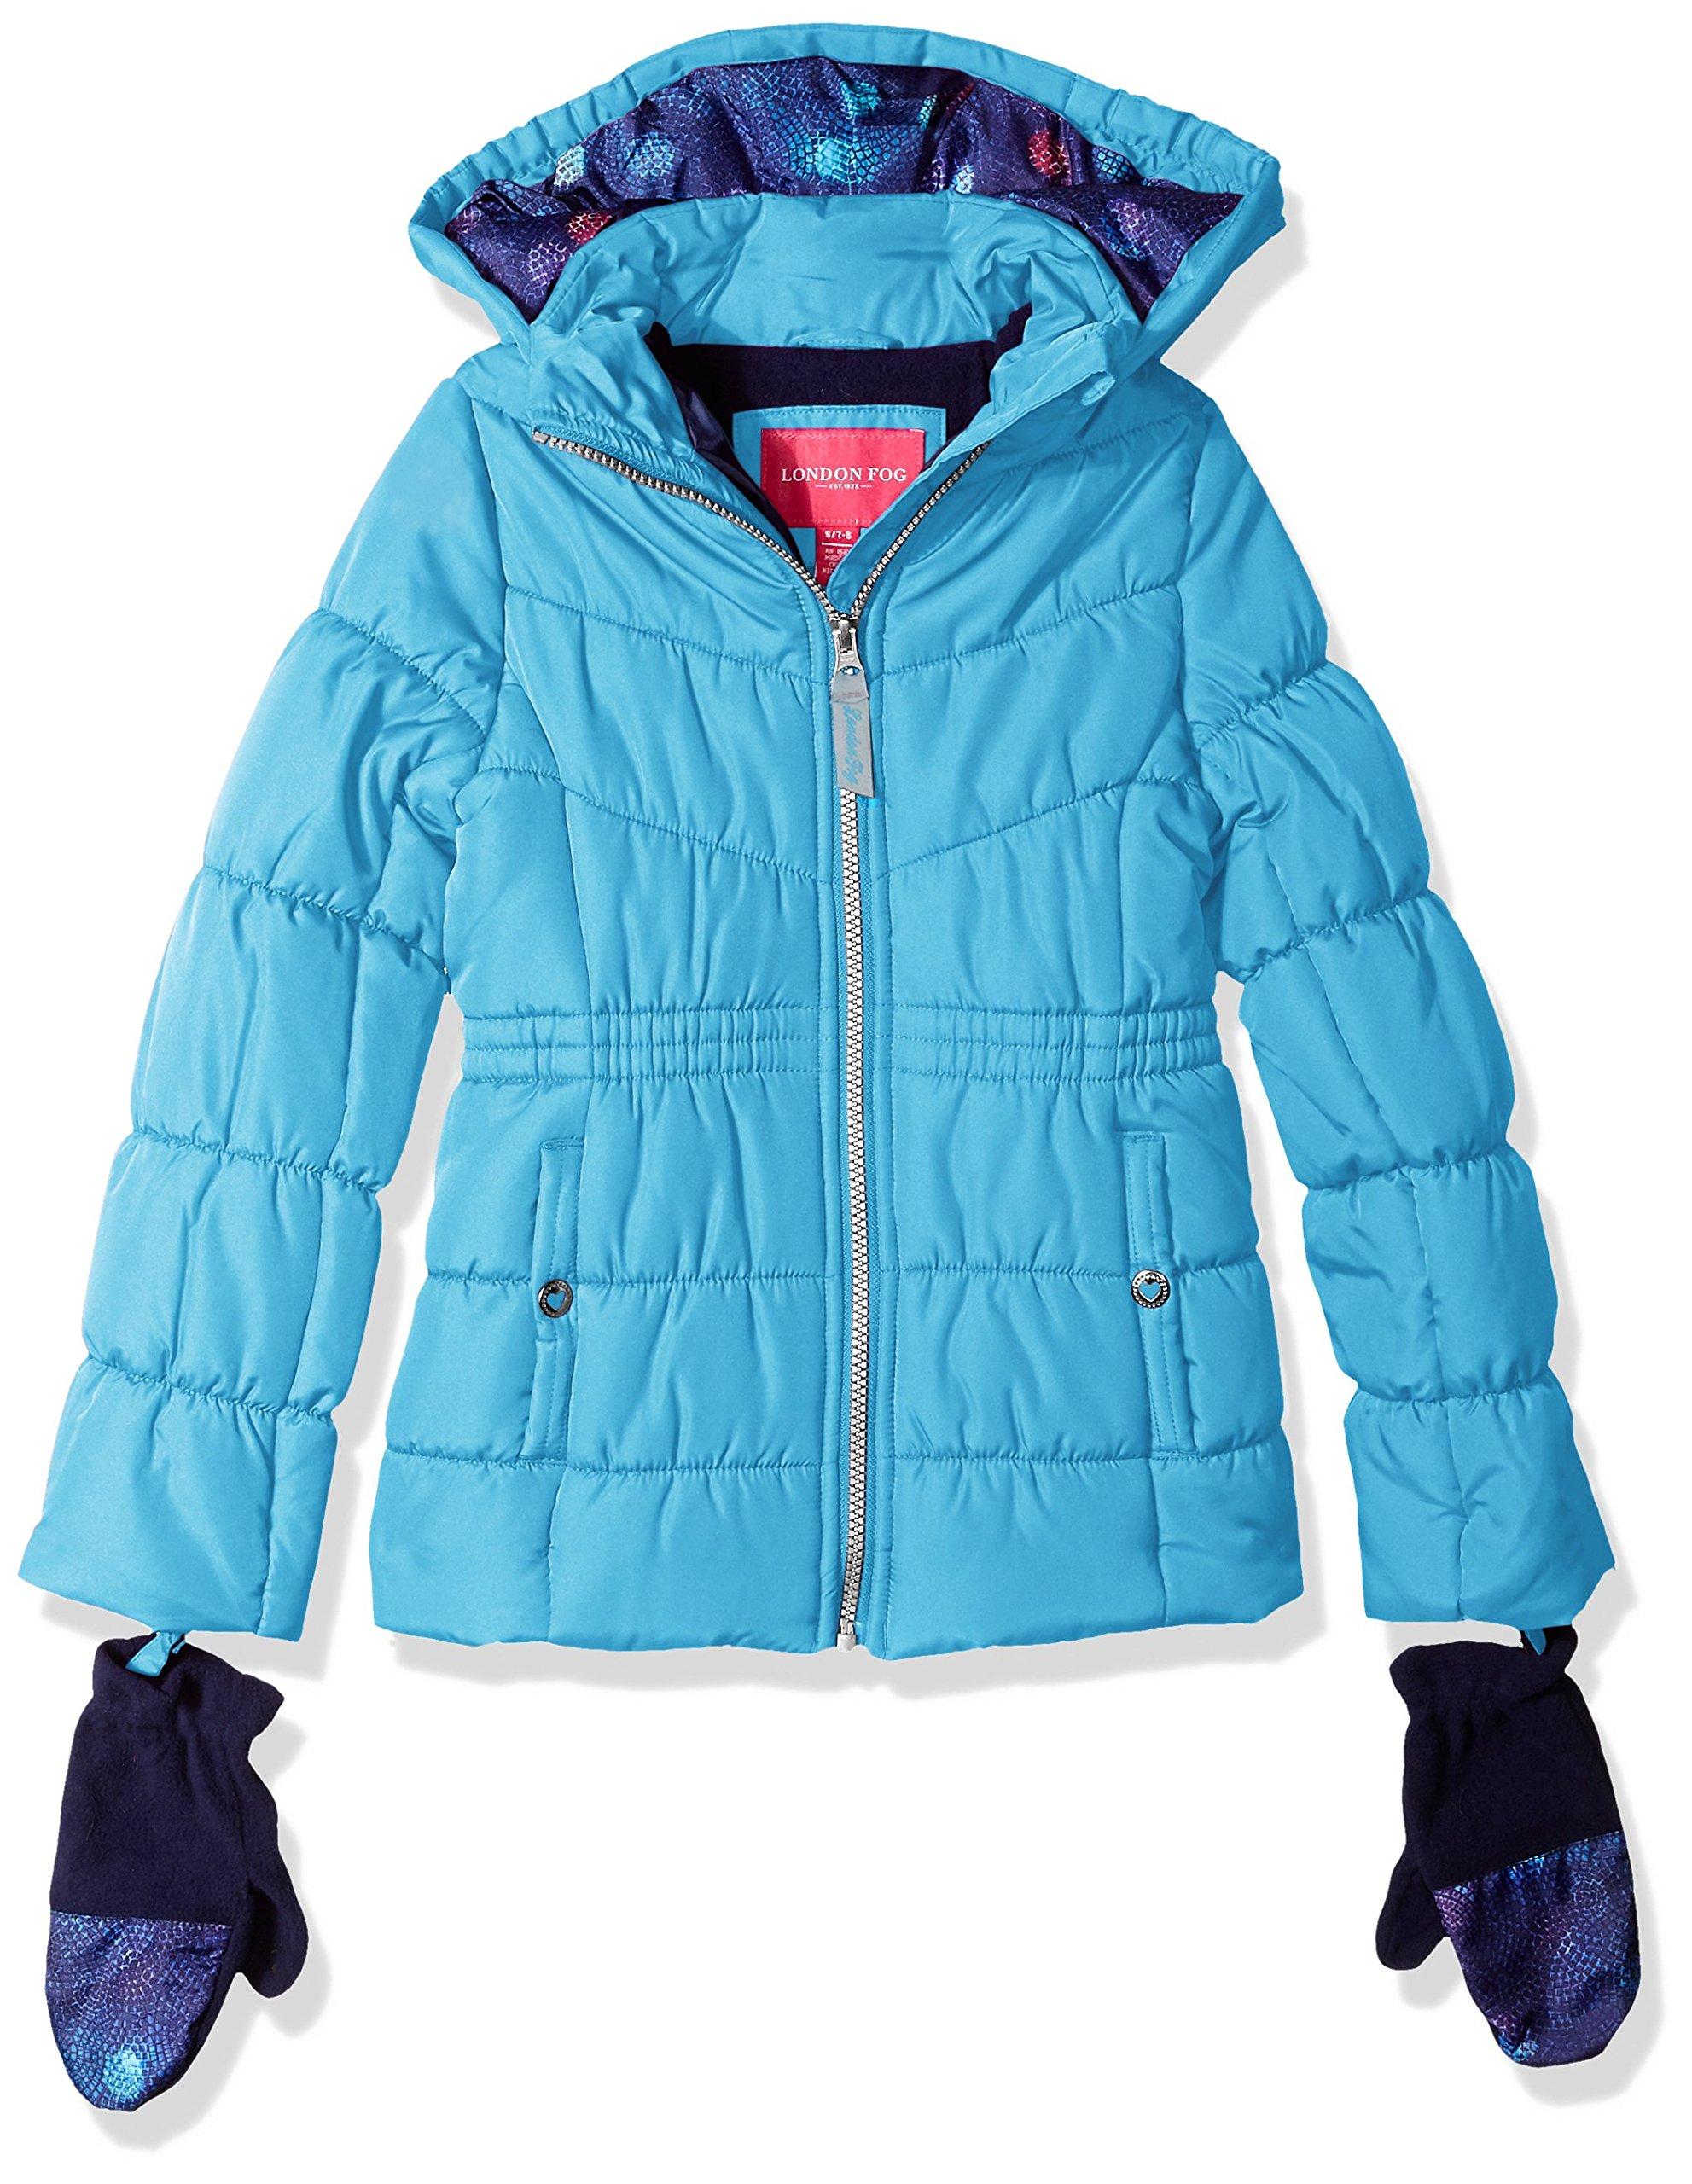 London Fog Big Girls' Warm Winter Jacket Coat Accessory, Turquoise, 10/12